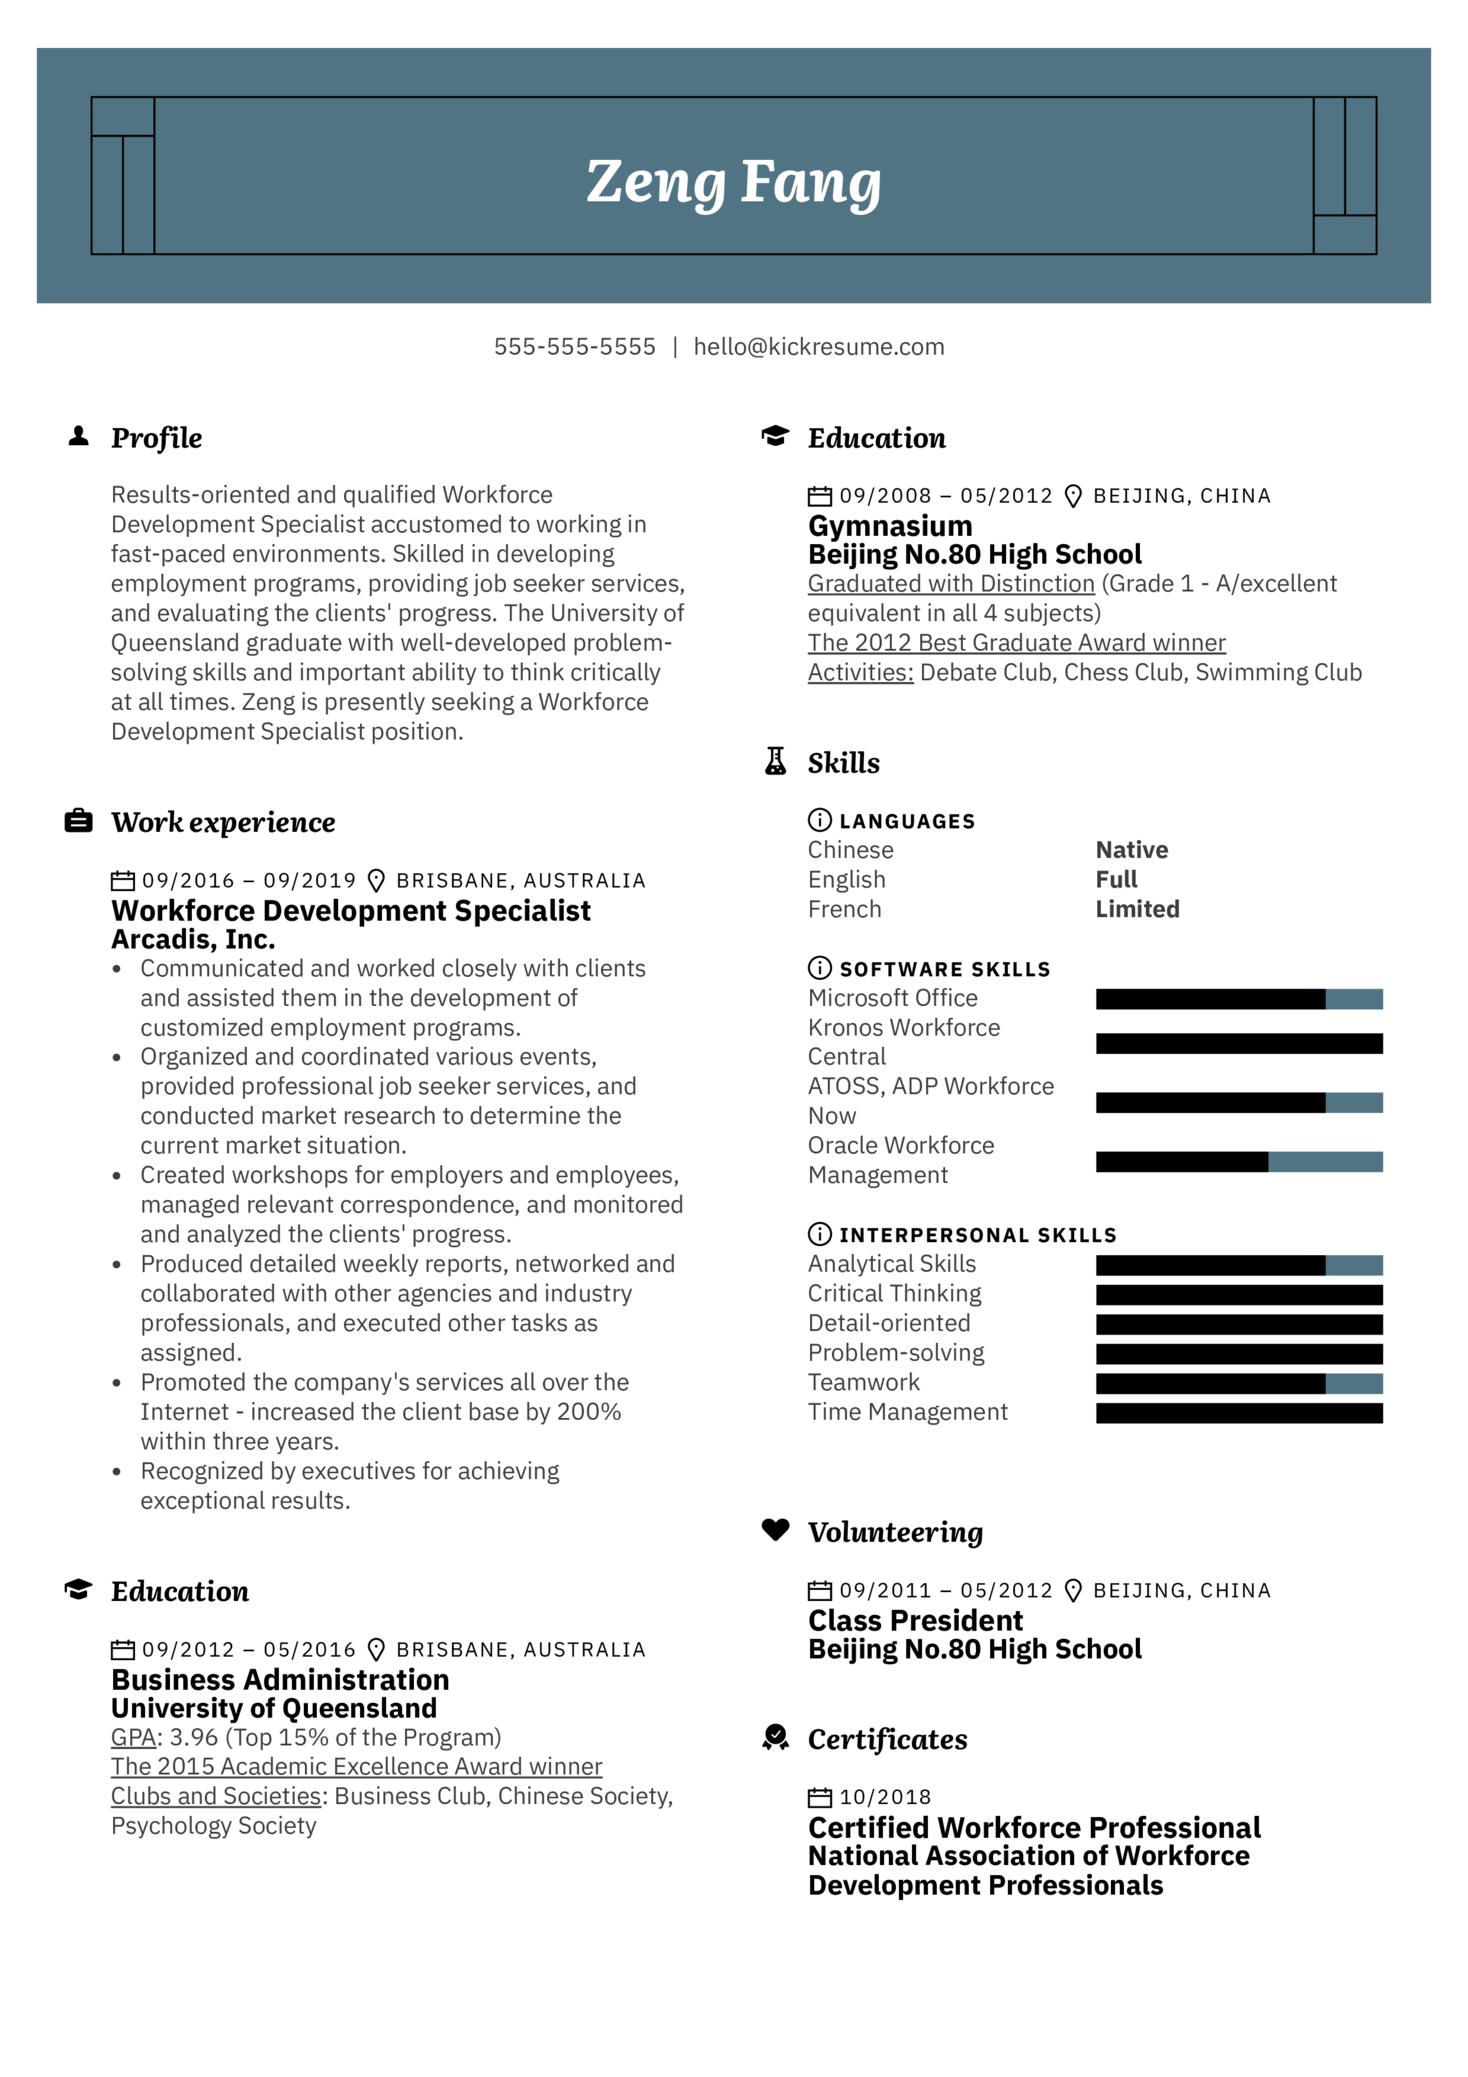 Workforce Development Specialist Resume Example (Parte 1)